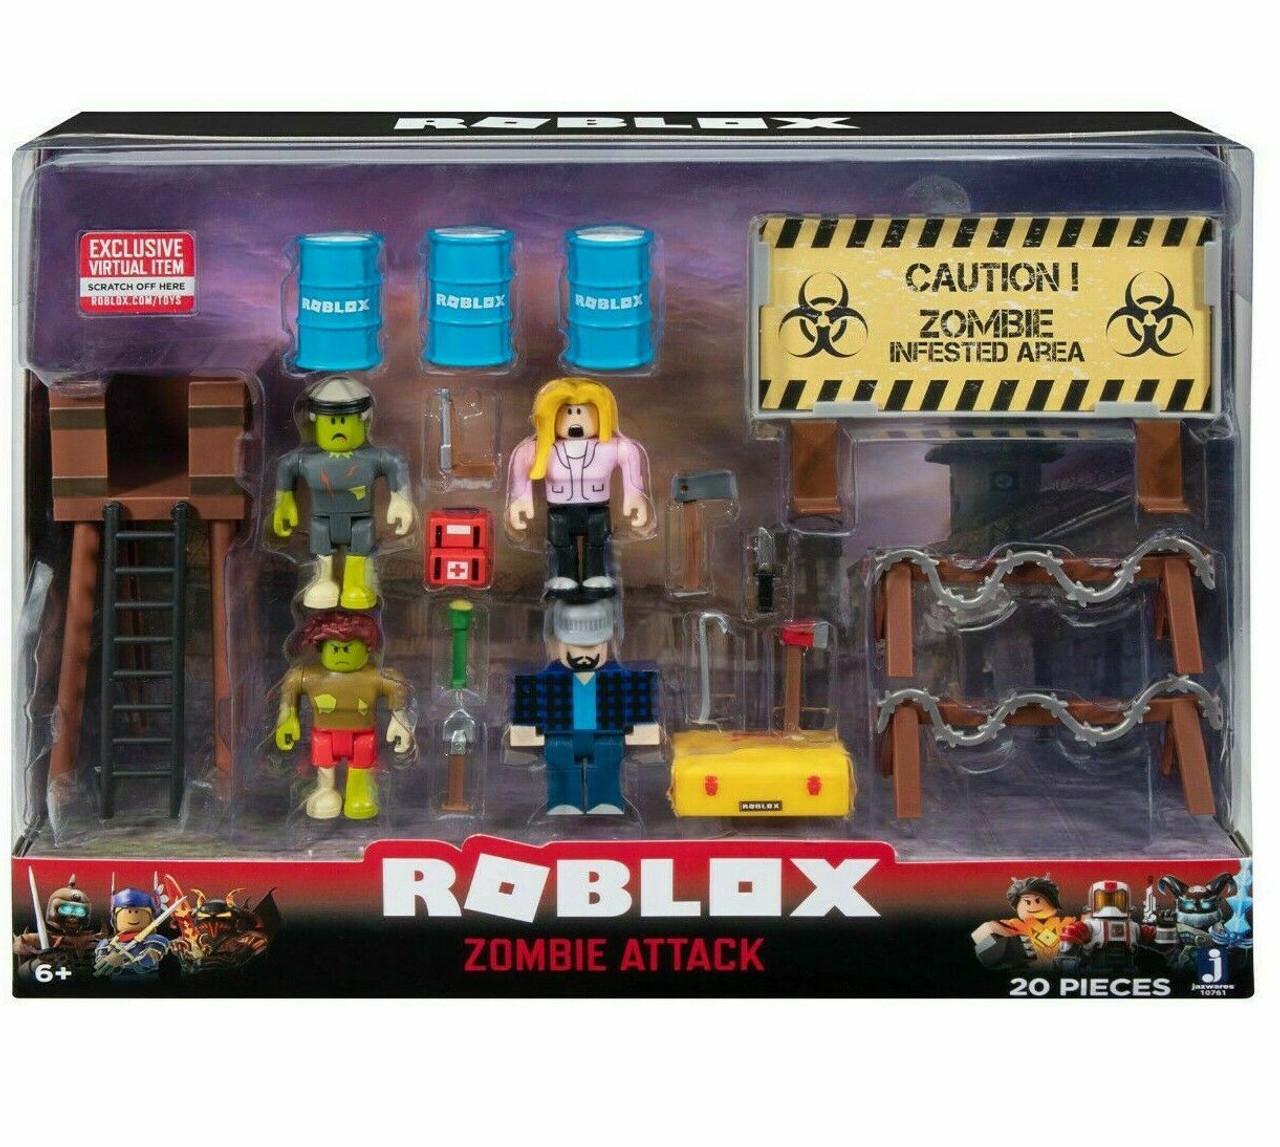 Roblox Zombie Attack Playset Jazwares Toywiz